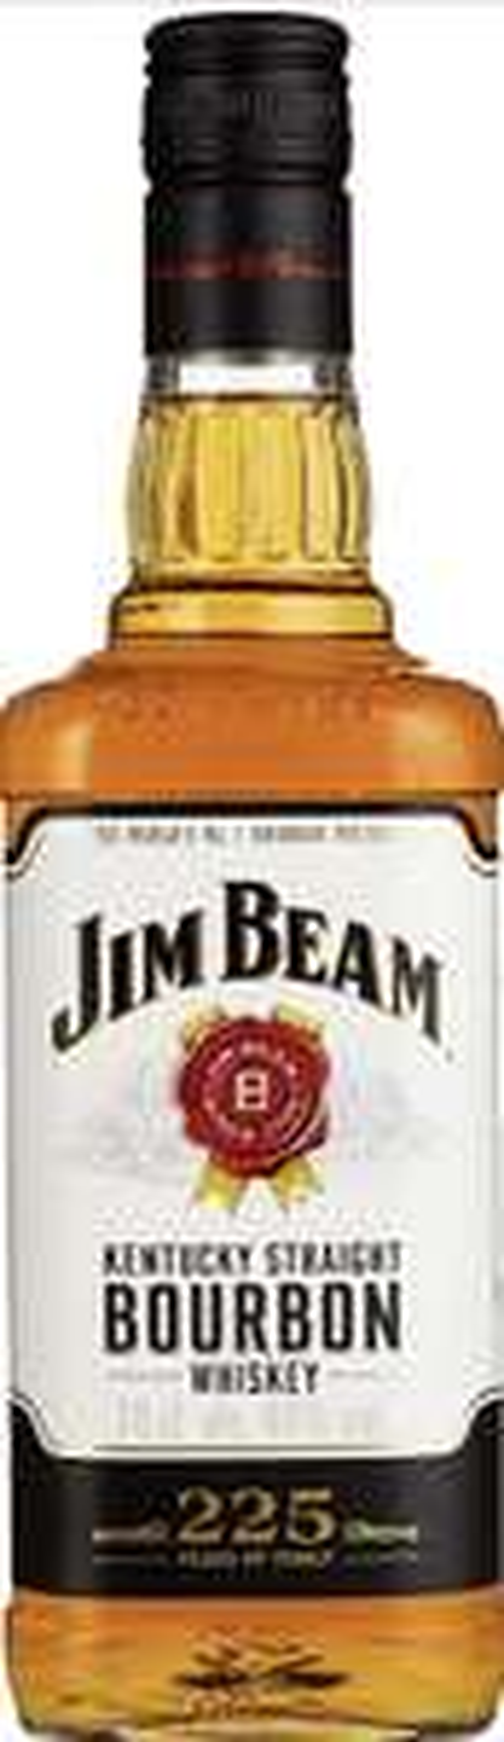 Jim Beam Kentucky Straight Bourbon Whiskey 40% Vol, 1 x 0,7